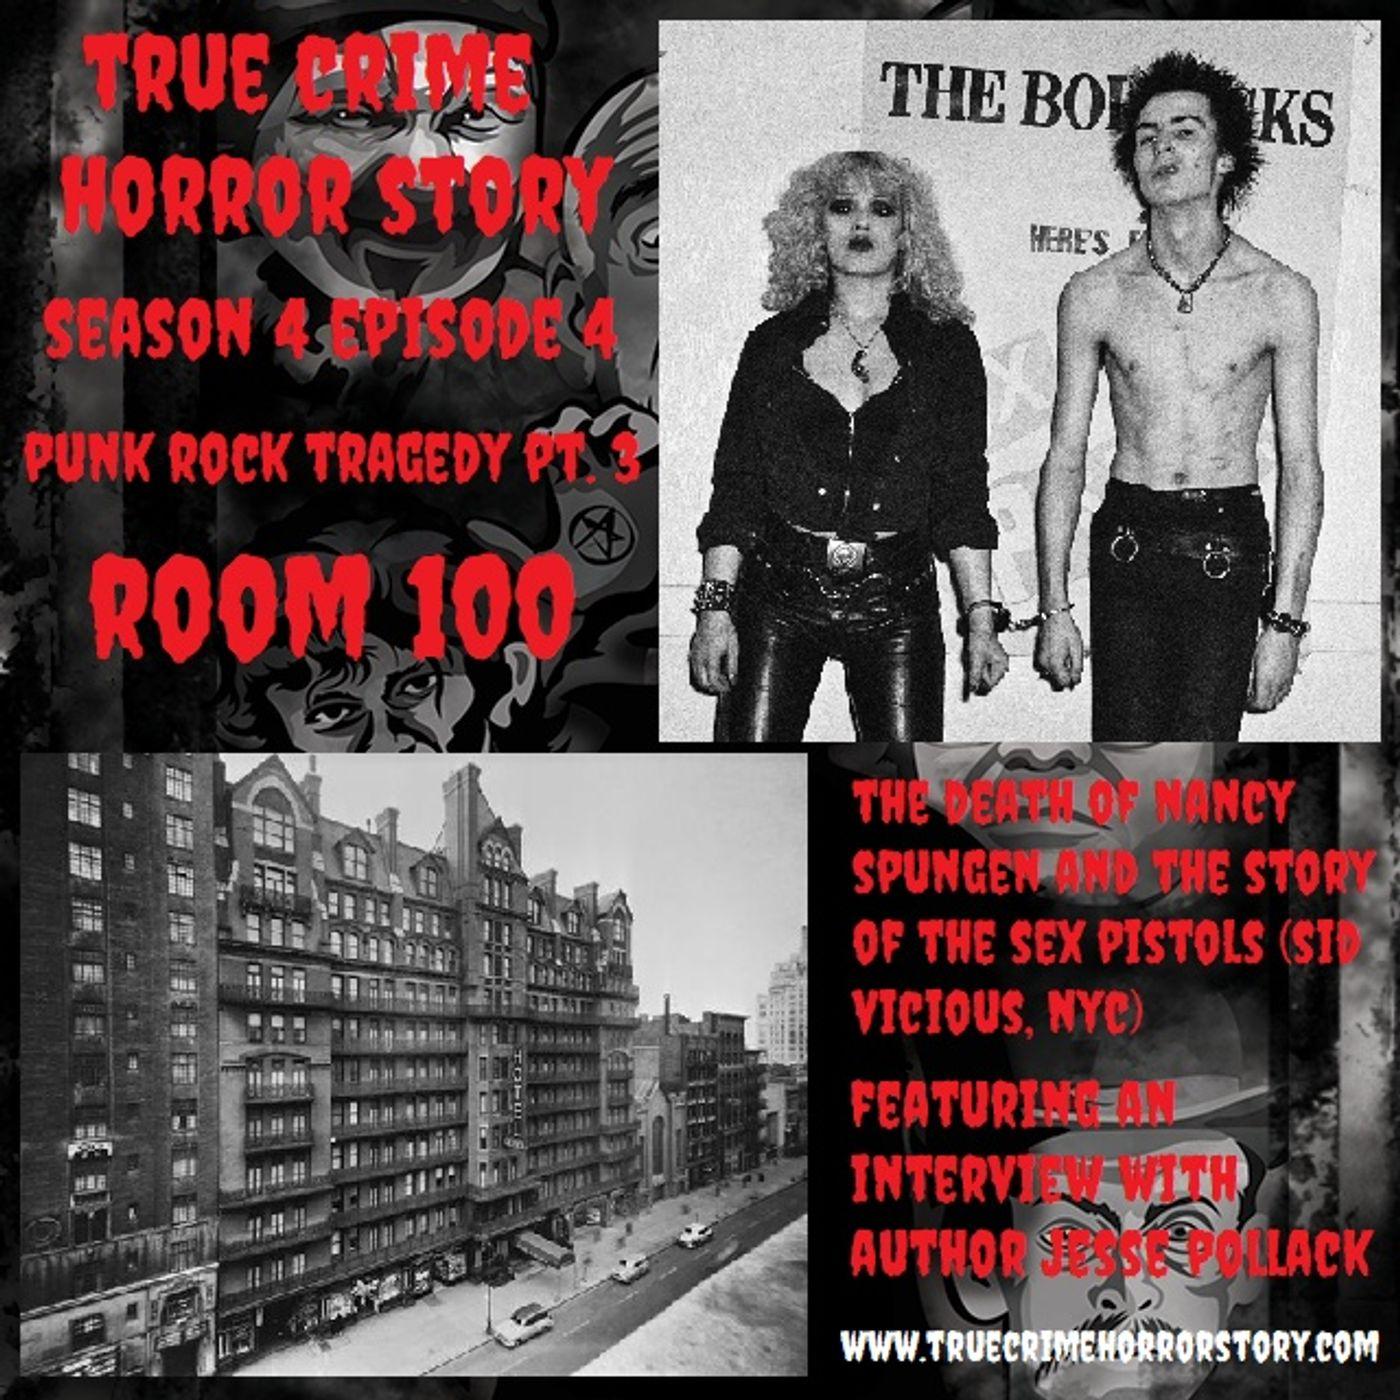 S4E4: Punk Rock Tragedy Pt. 3 (Room 100)